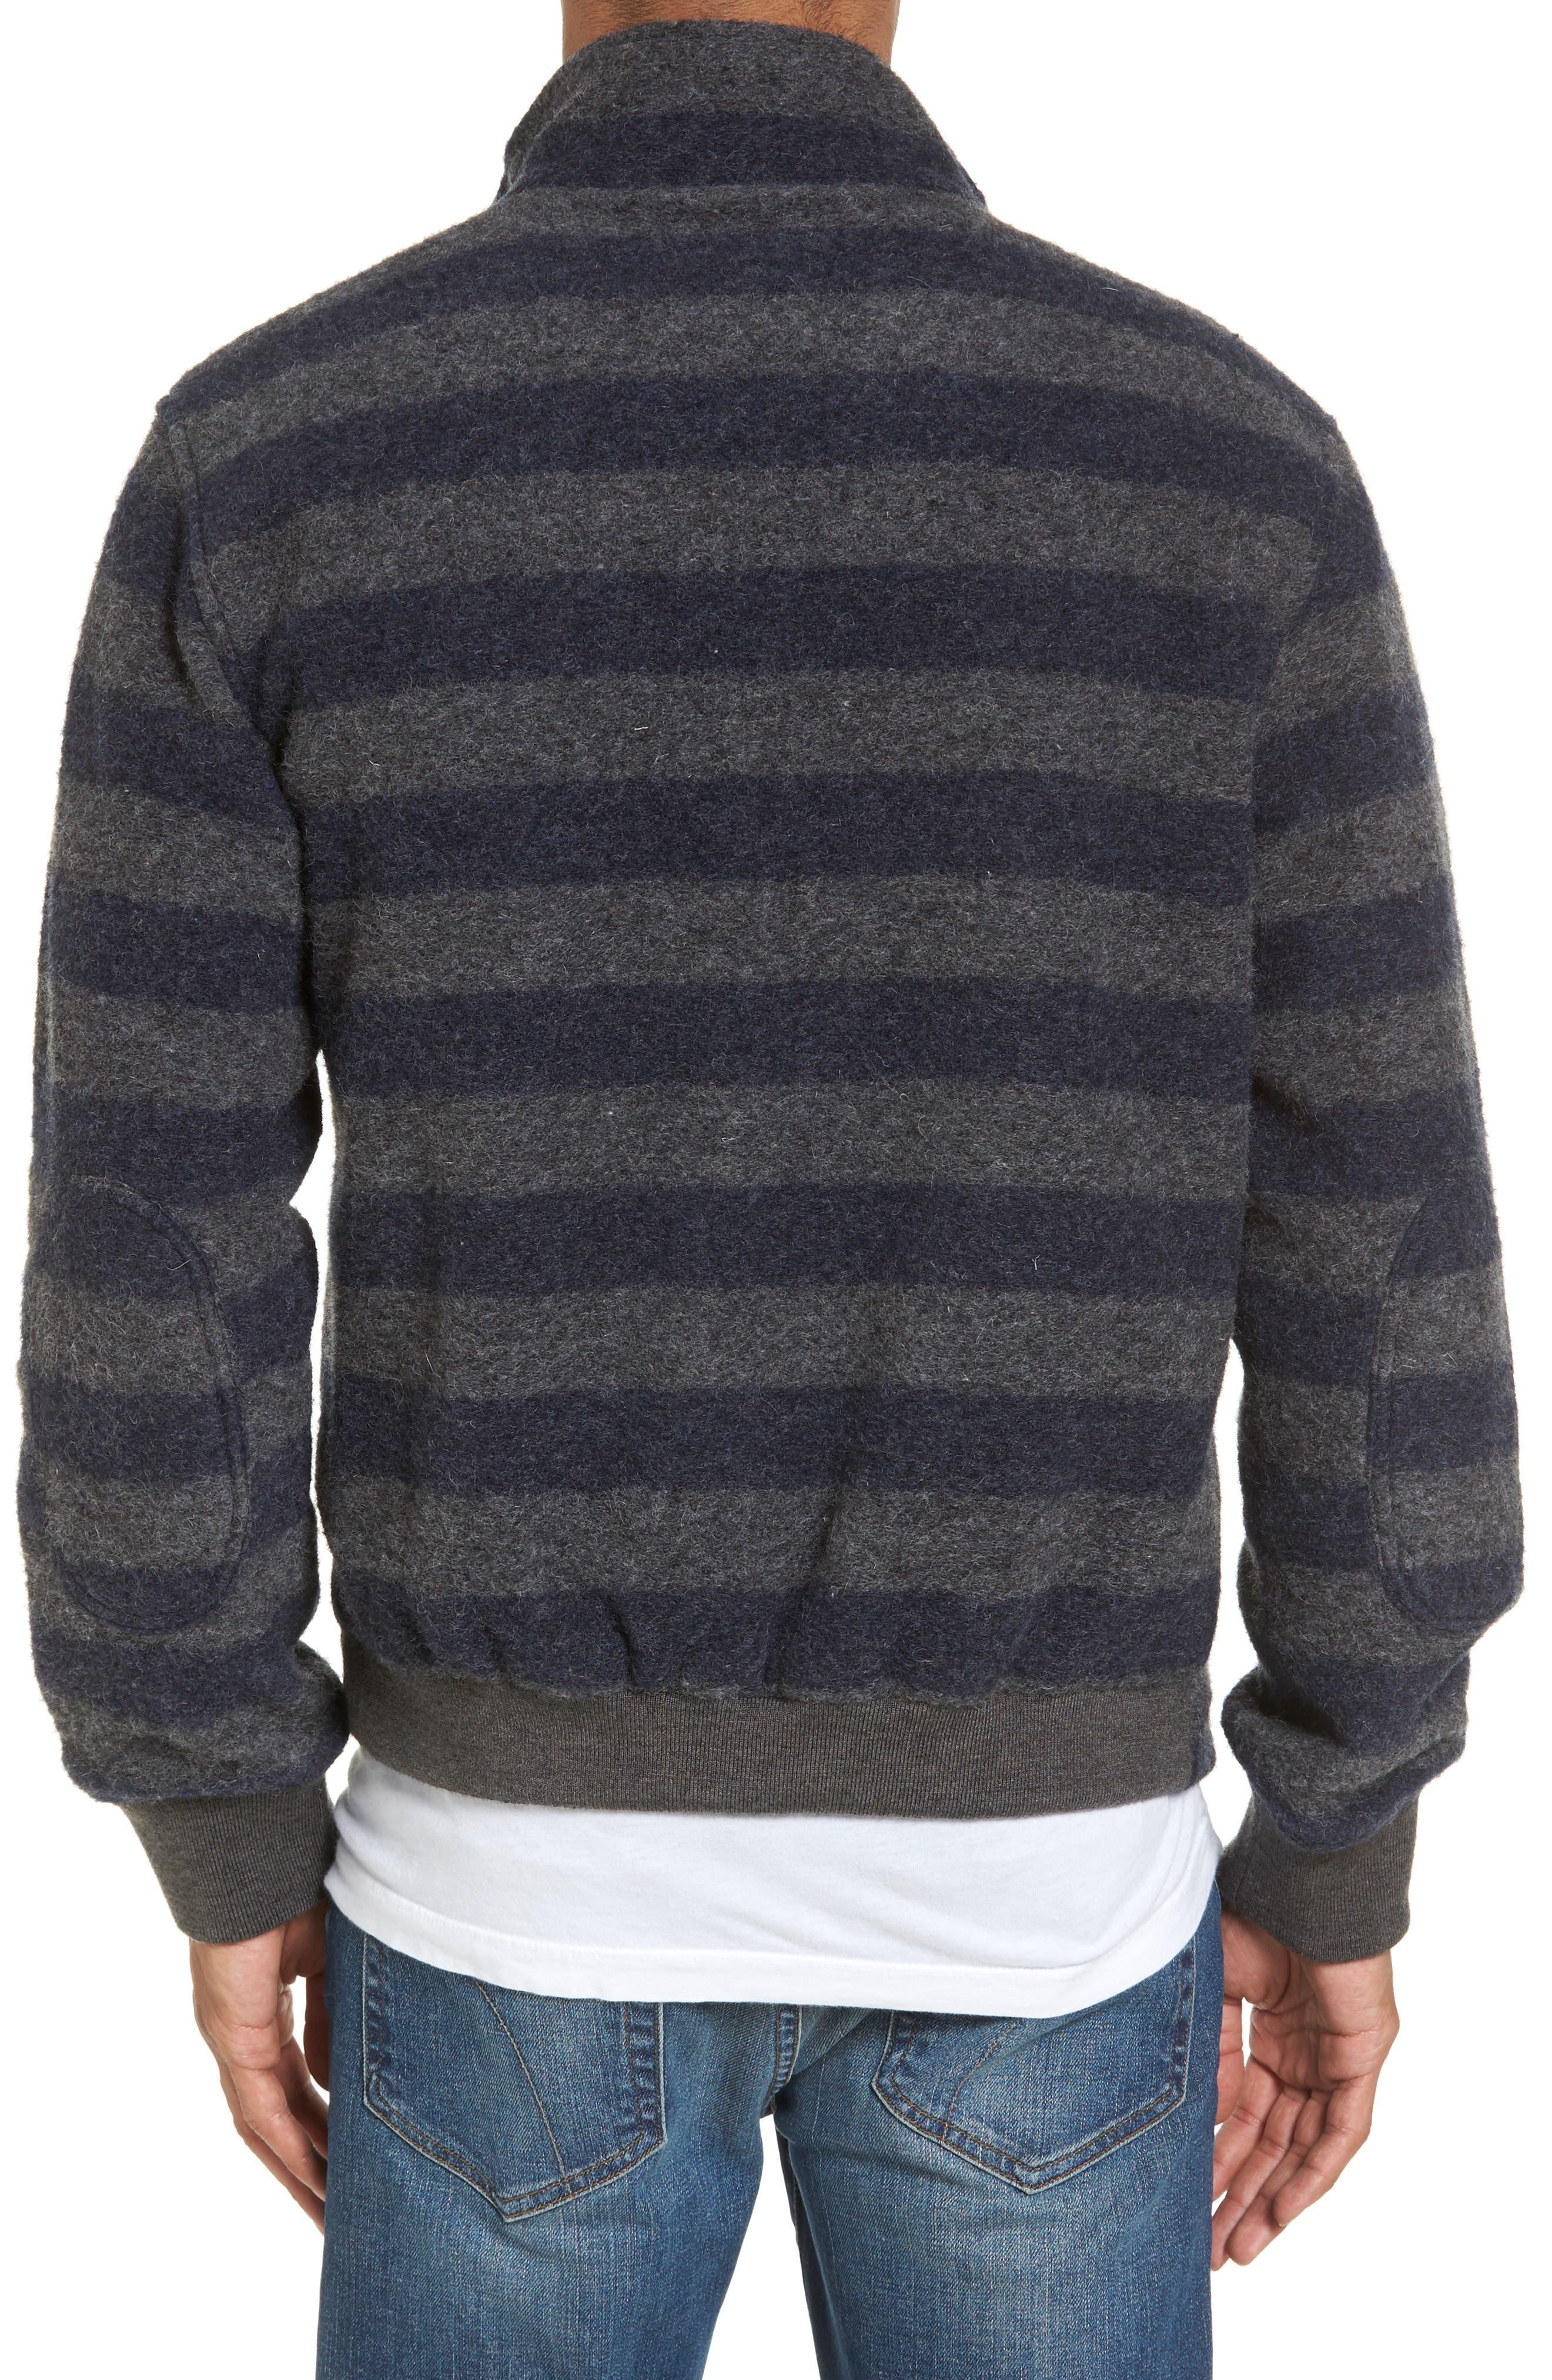 Bowen Stripe Zip Front Jacket,                             Alternate thumbnail 2, color,                             Grey Navy Stripe